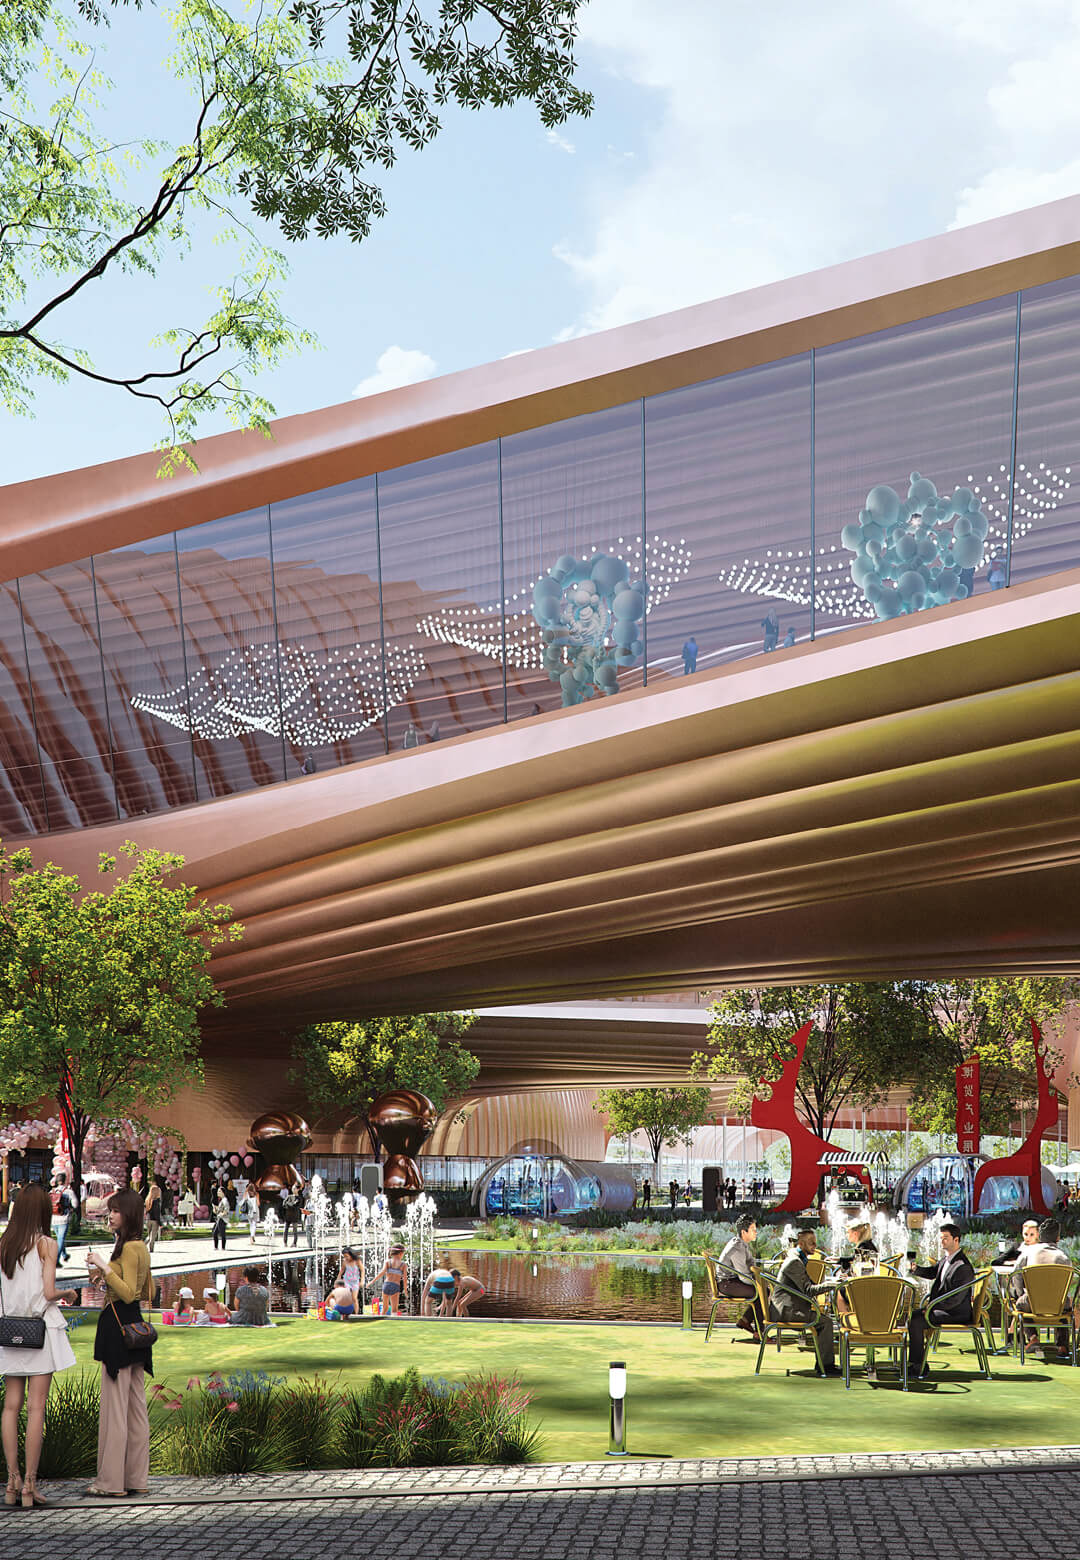 Winning design for Phase II- International Exhibition Centre in Beijing by ZHA | International Exhibition Centre (Phase-II) by Zaha Hadid Architects | STIRworld